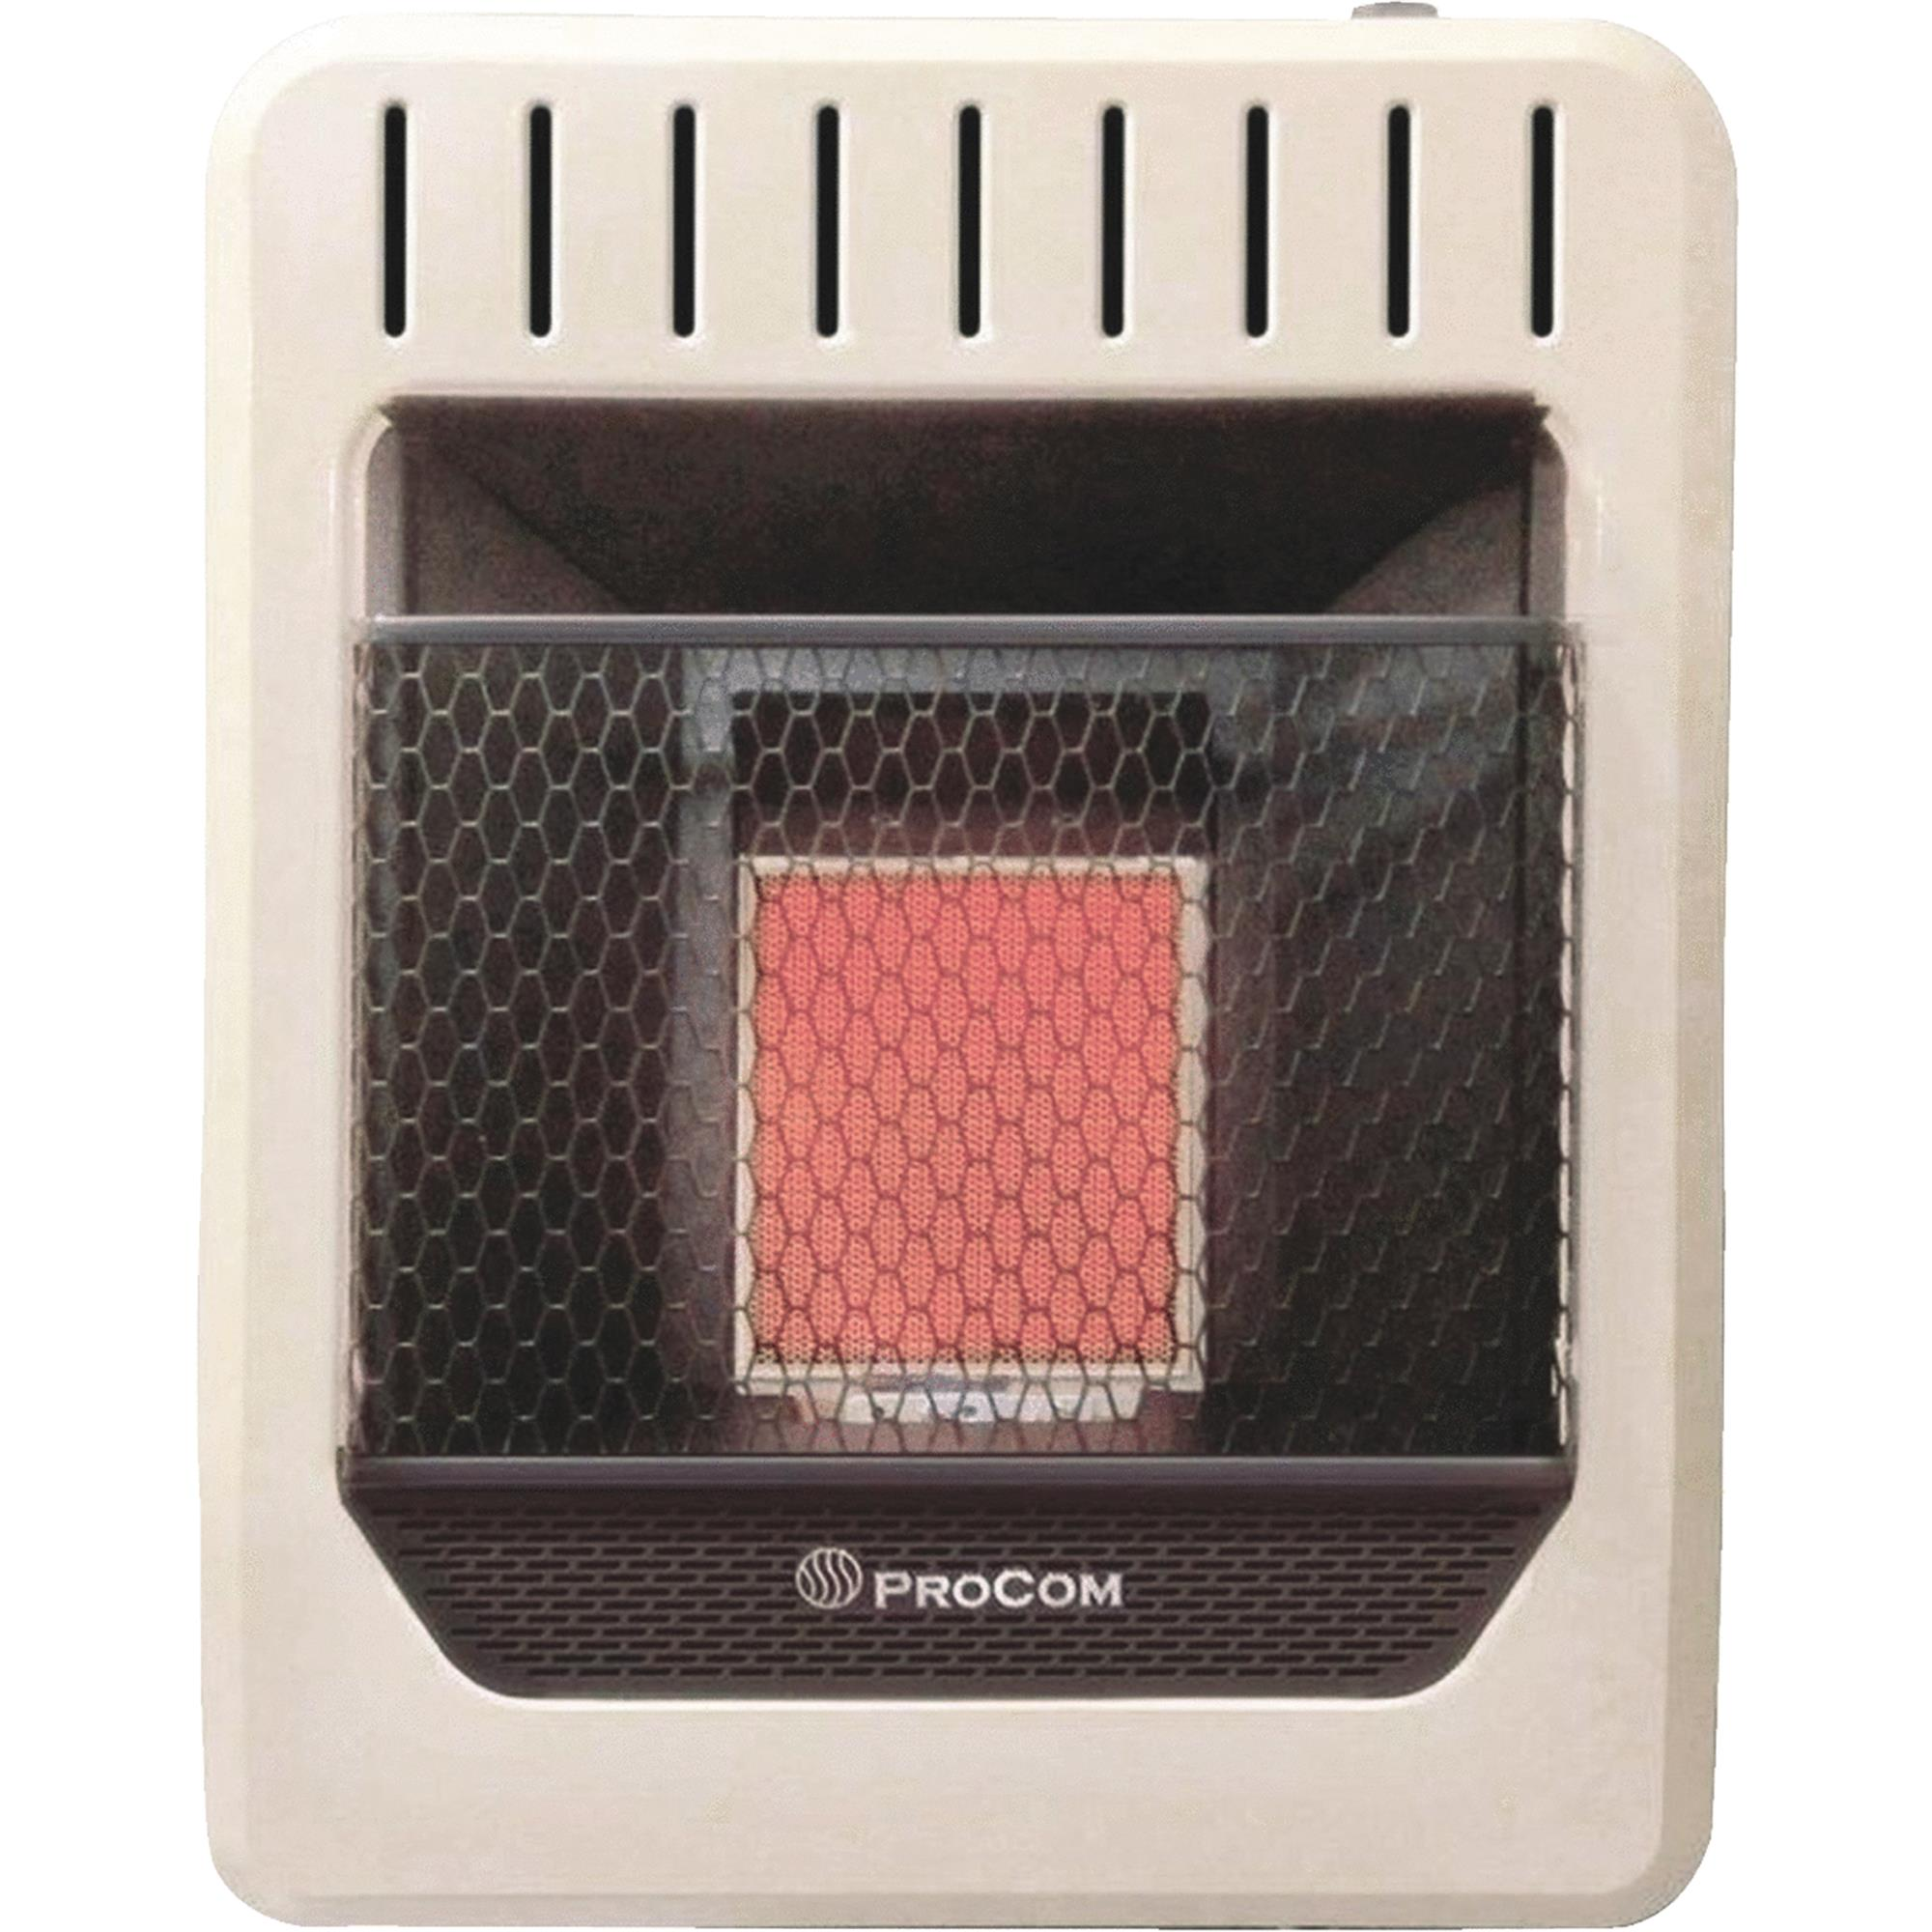 ProCom Dual Fuel Infrared Gas Wall Heater